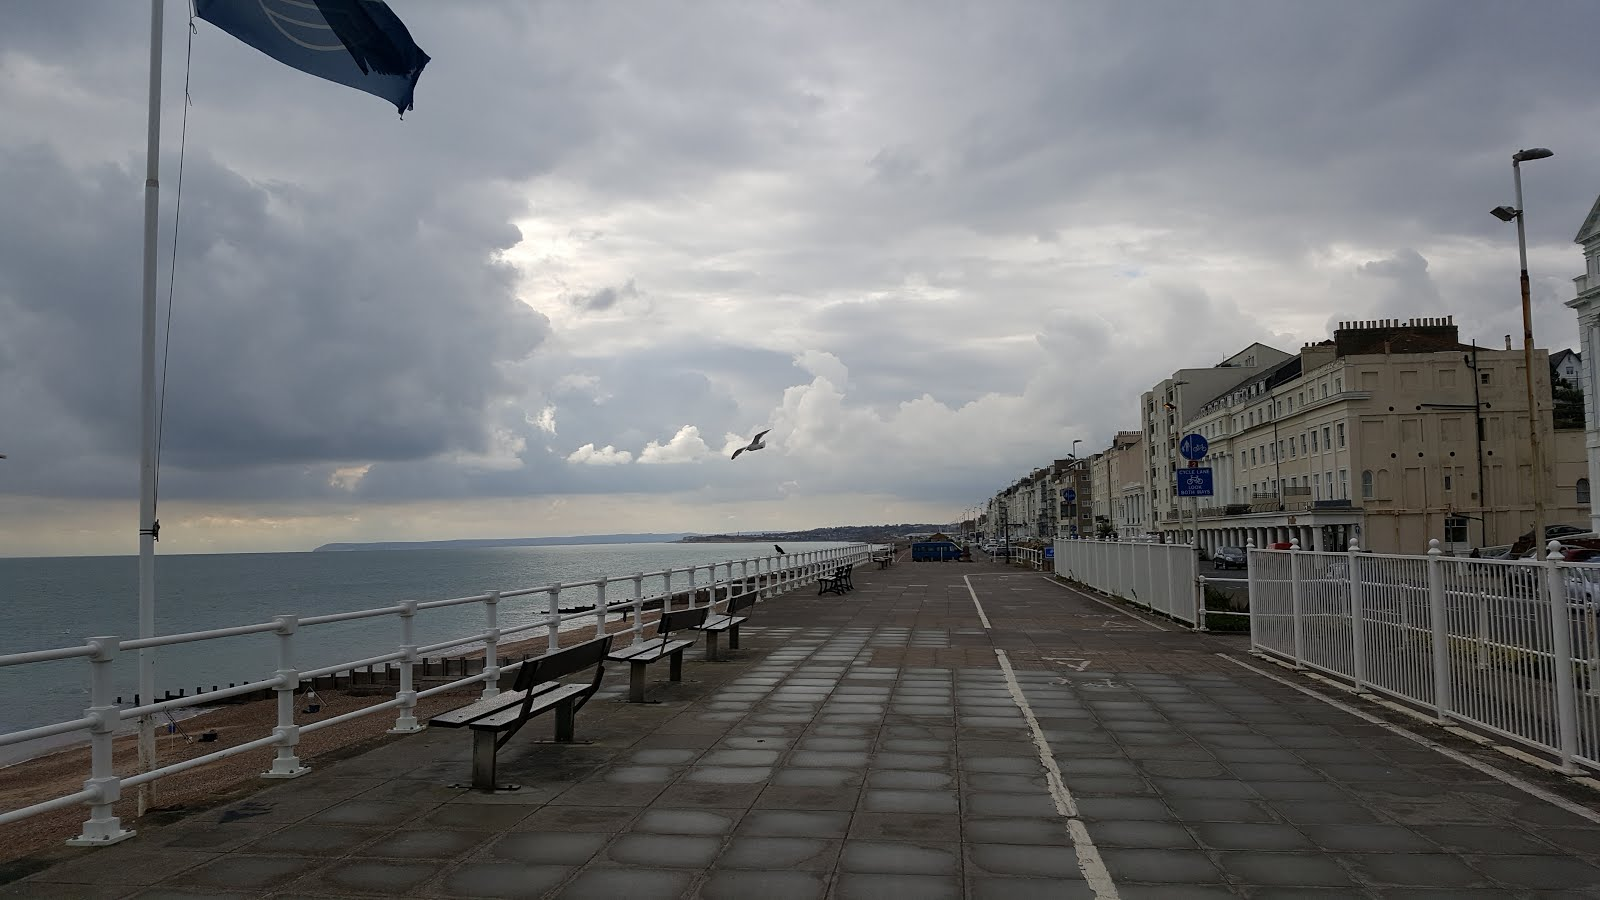 St Leonard's seafront